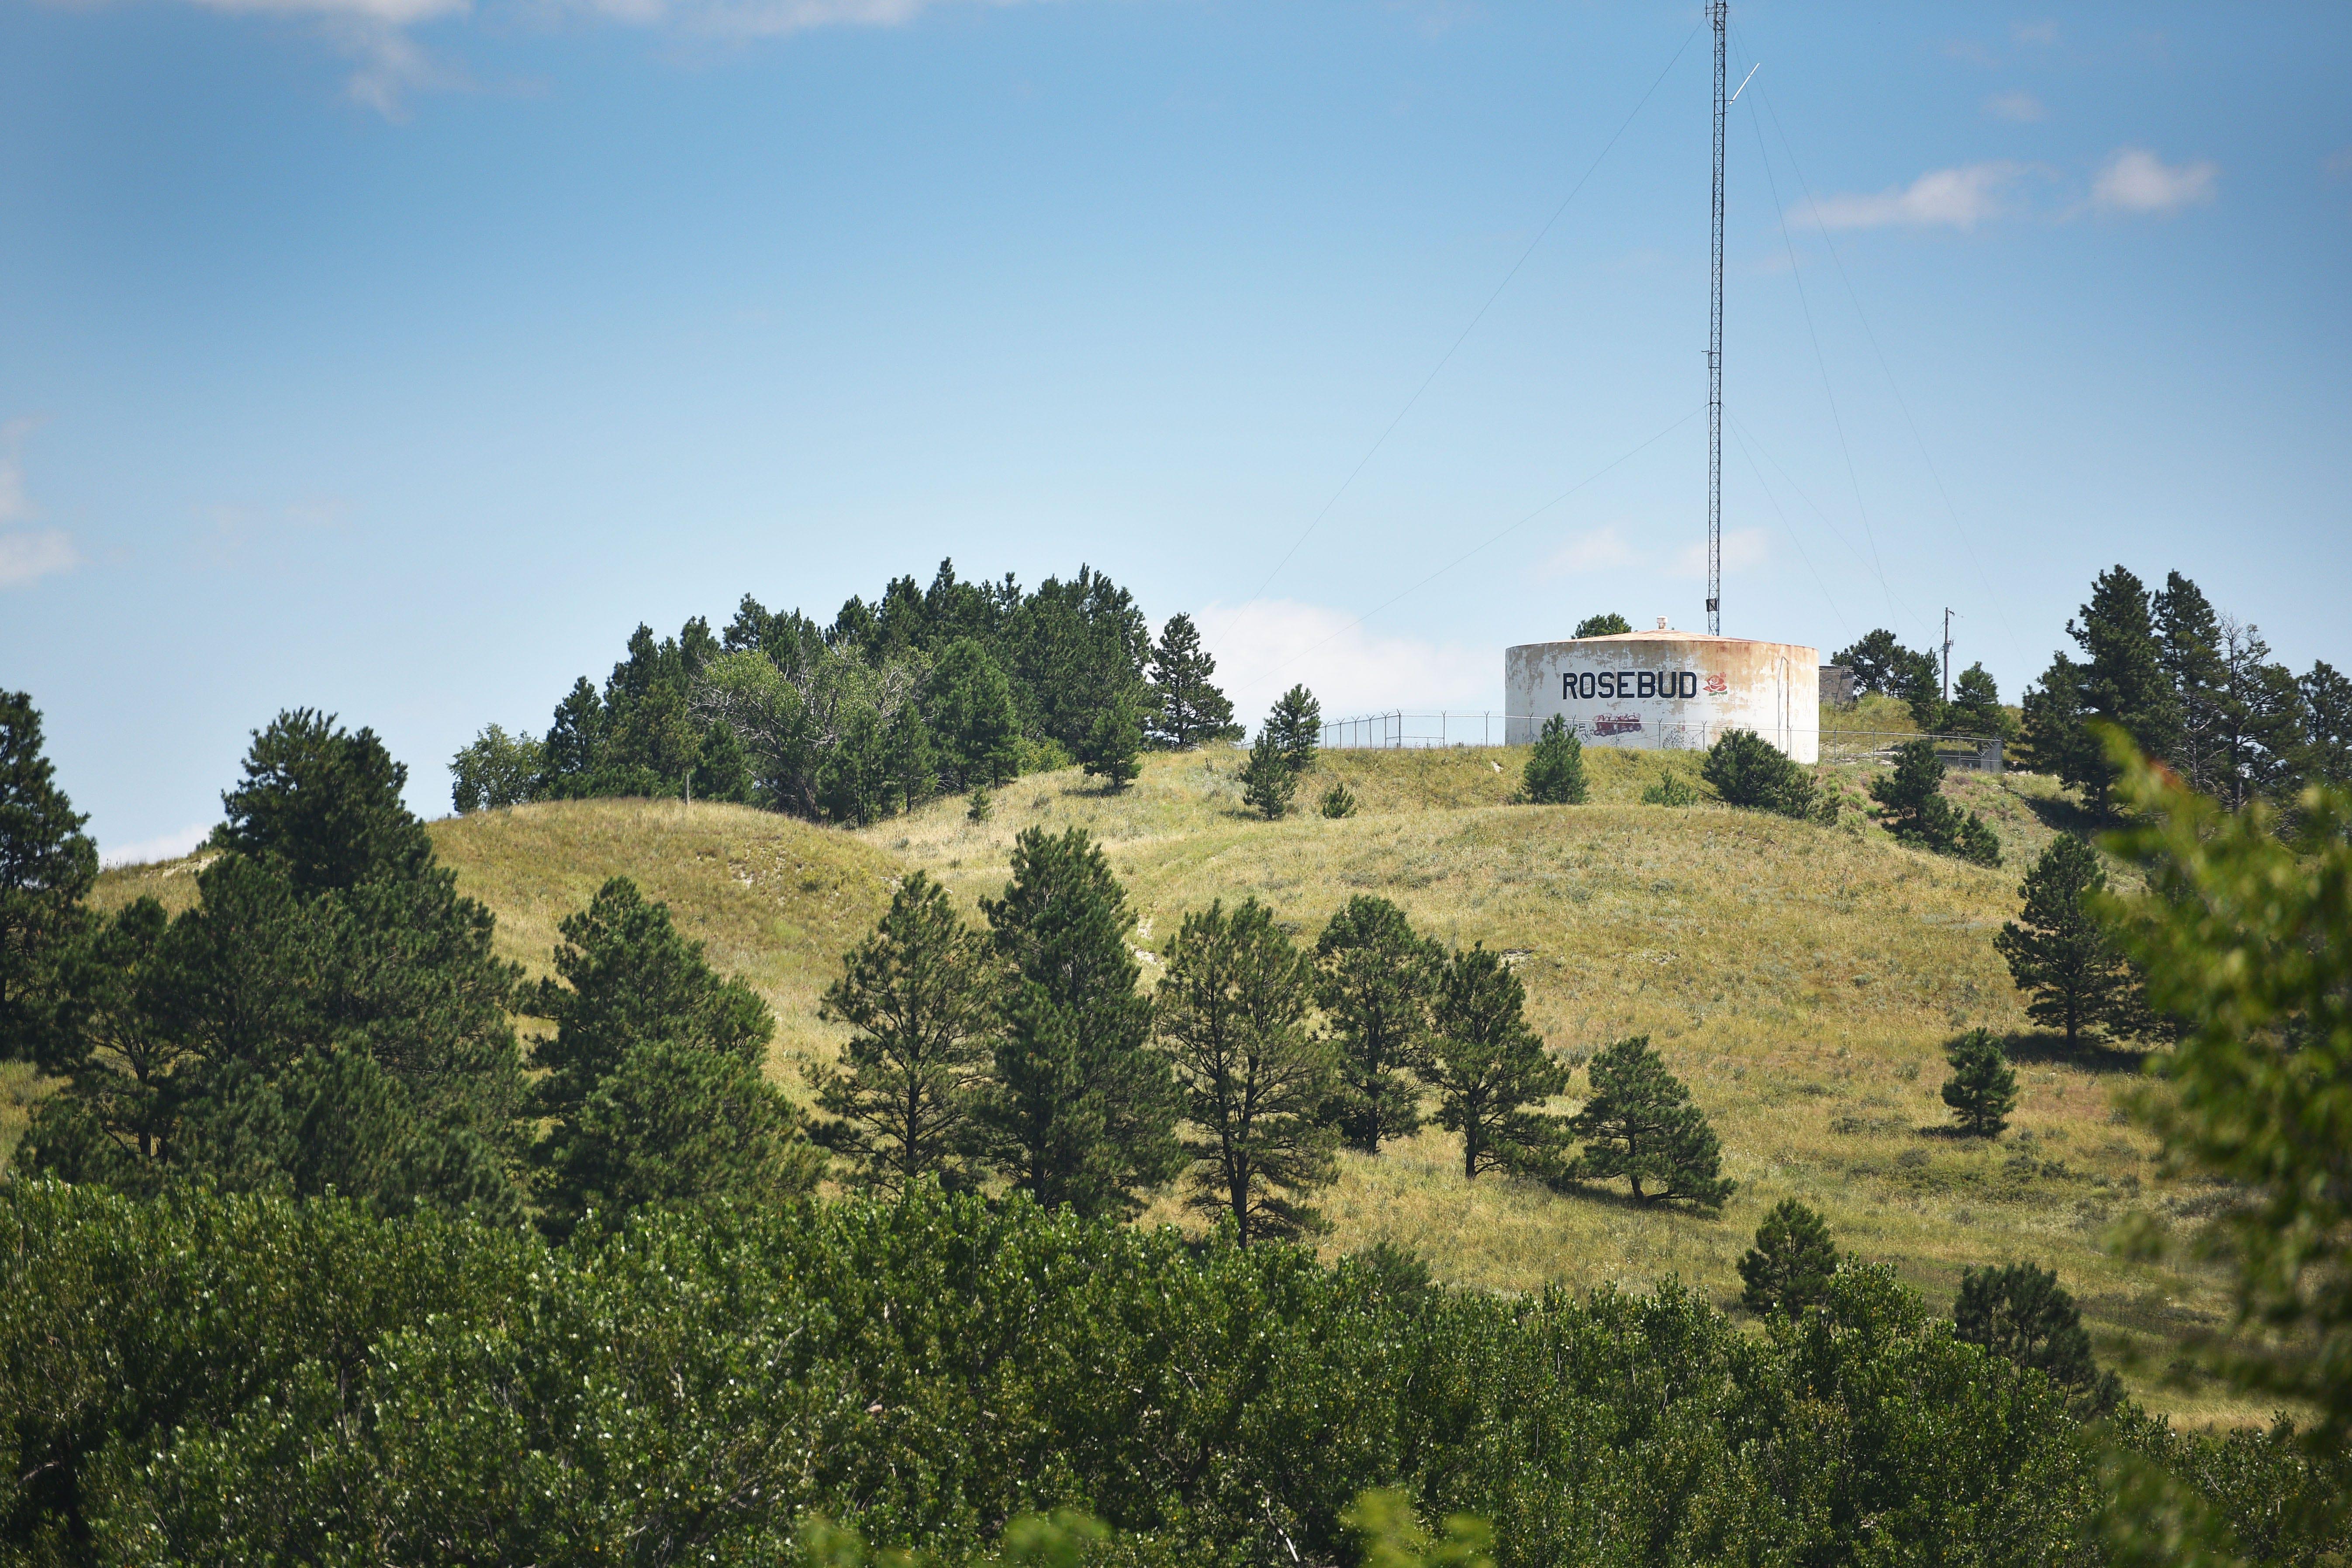 Rosebud reservation Tuesday, July 31, in Rosebud.